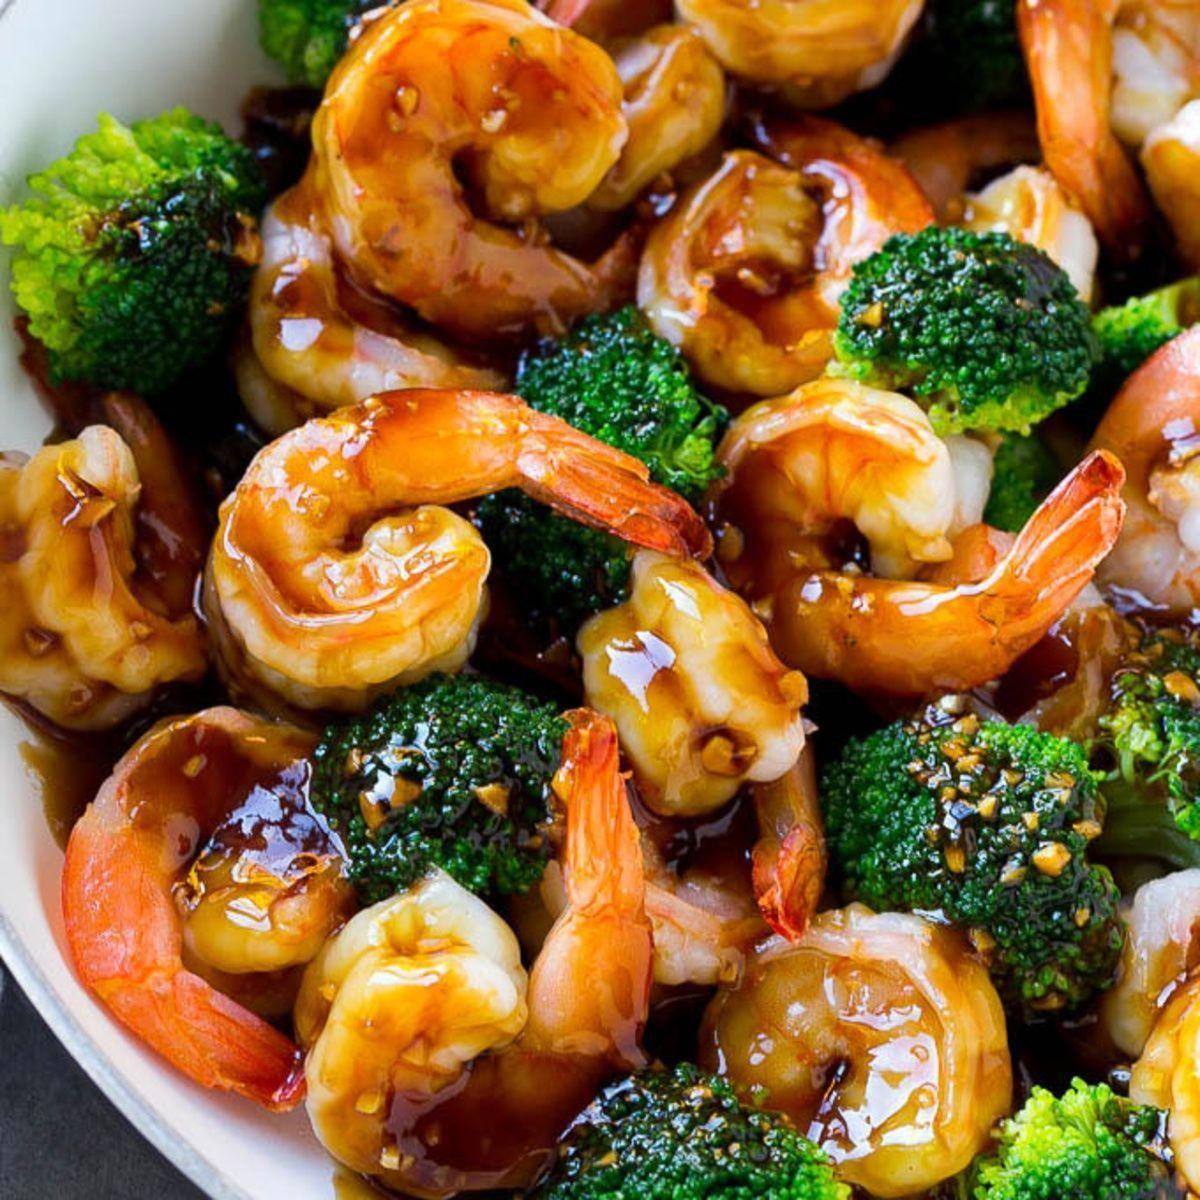 Honey Garlic Shrimp Stir Fry - My Recipe Magic #asian #stirfry #dinner #shrimprecipes #stirfryshrimp Honey Garlic Shrimp Stir Fry - My Recipe Magic #asian #stirfry #dinner #shrimprecipes #stirfryshrimp